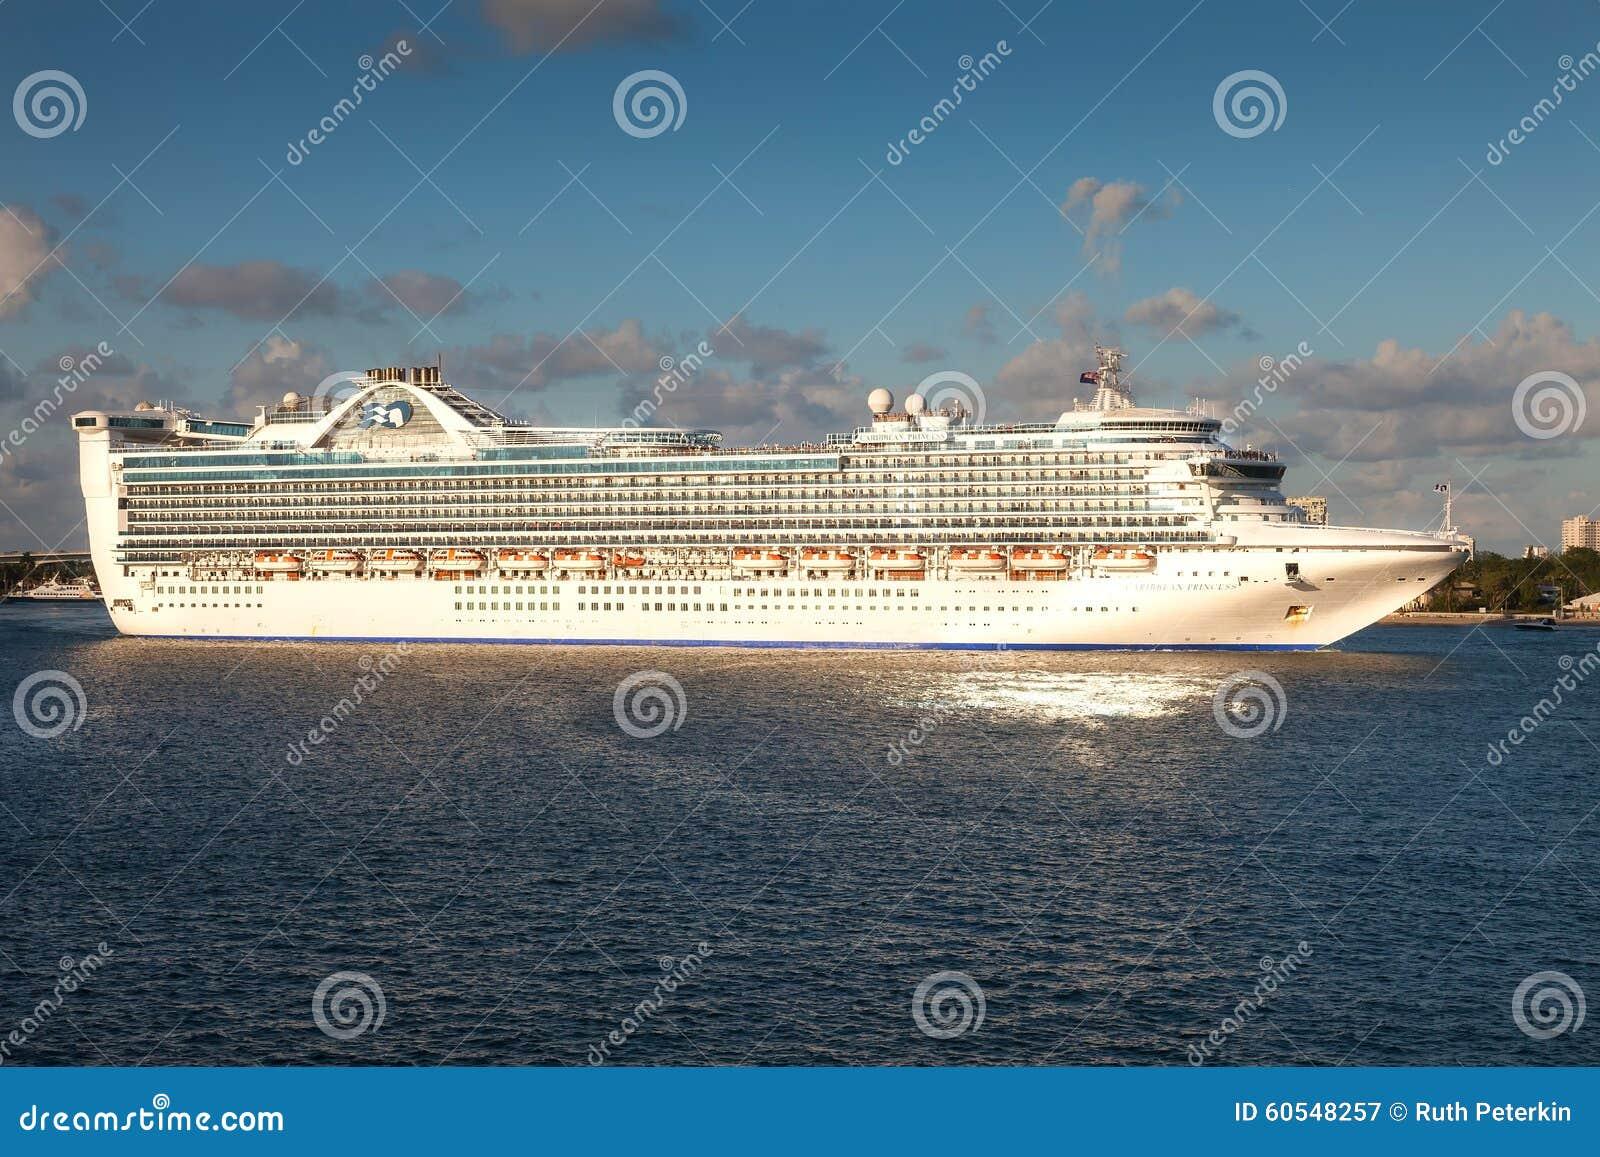 Luxury Backwater Cruises Kerala 09 Princess Cruise Ft Lauderdale To Rome